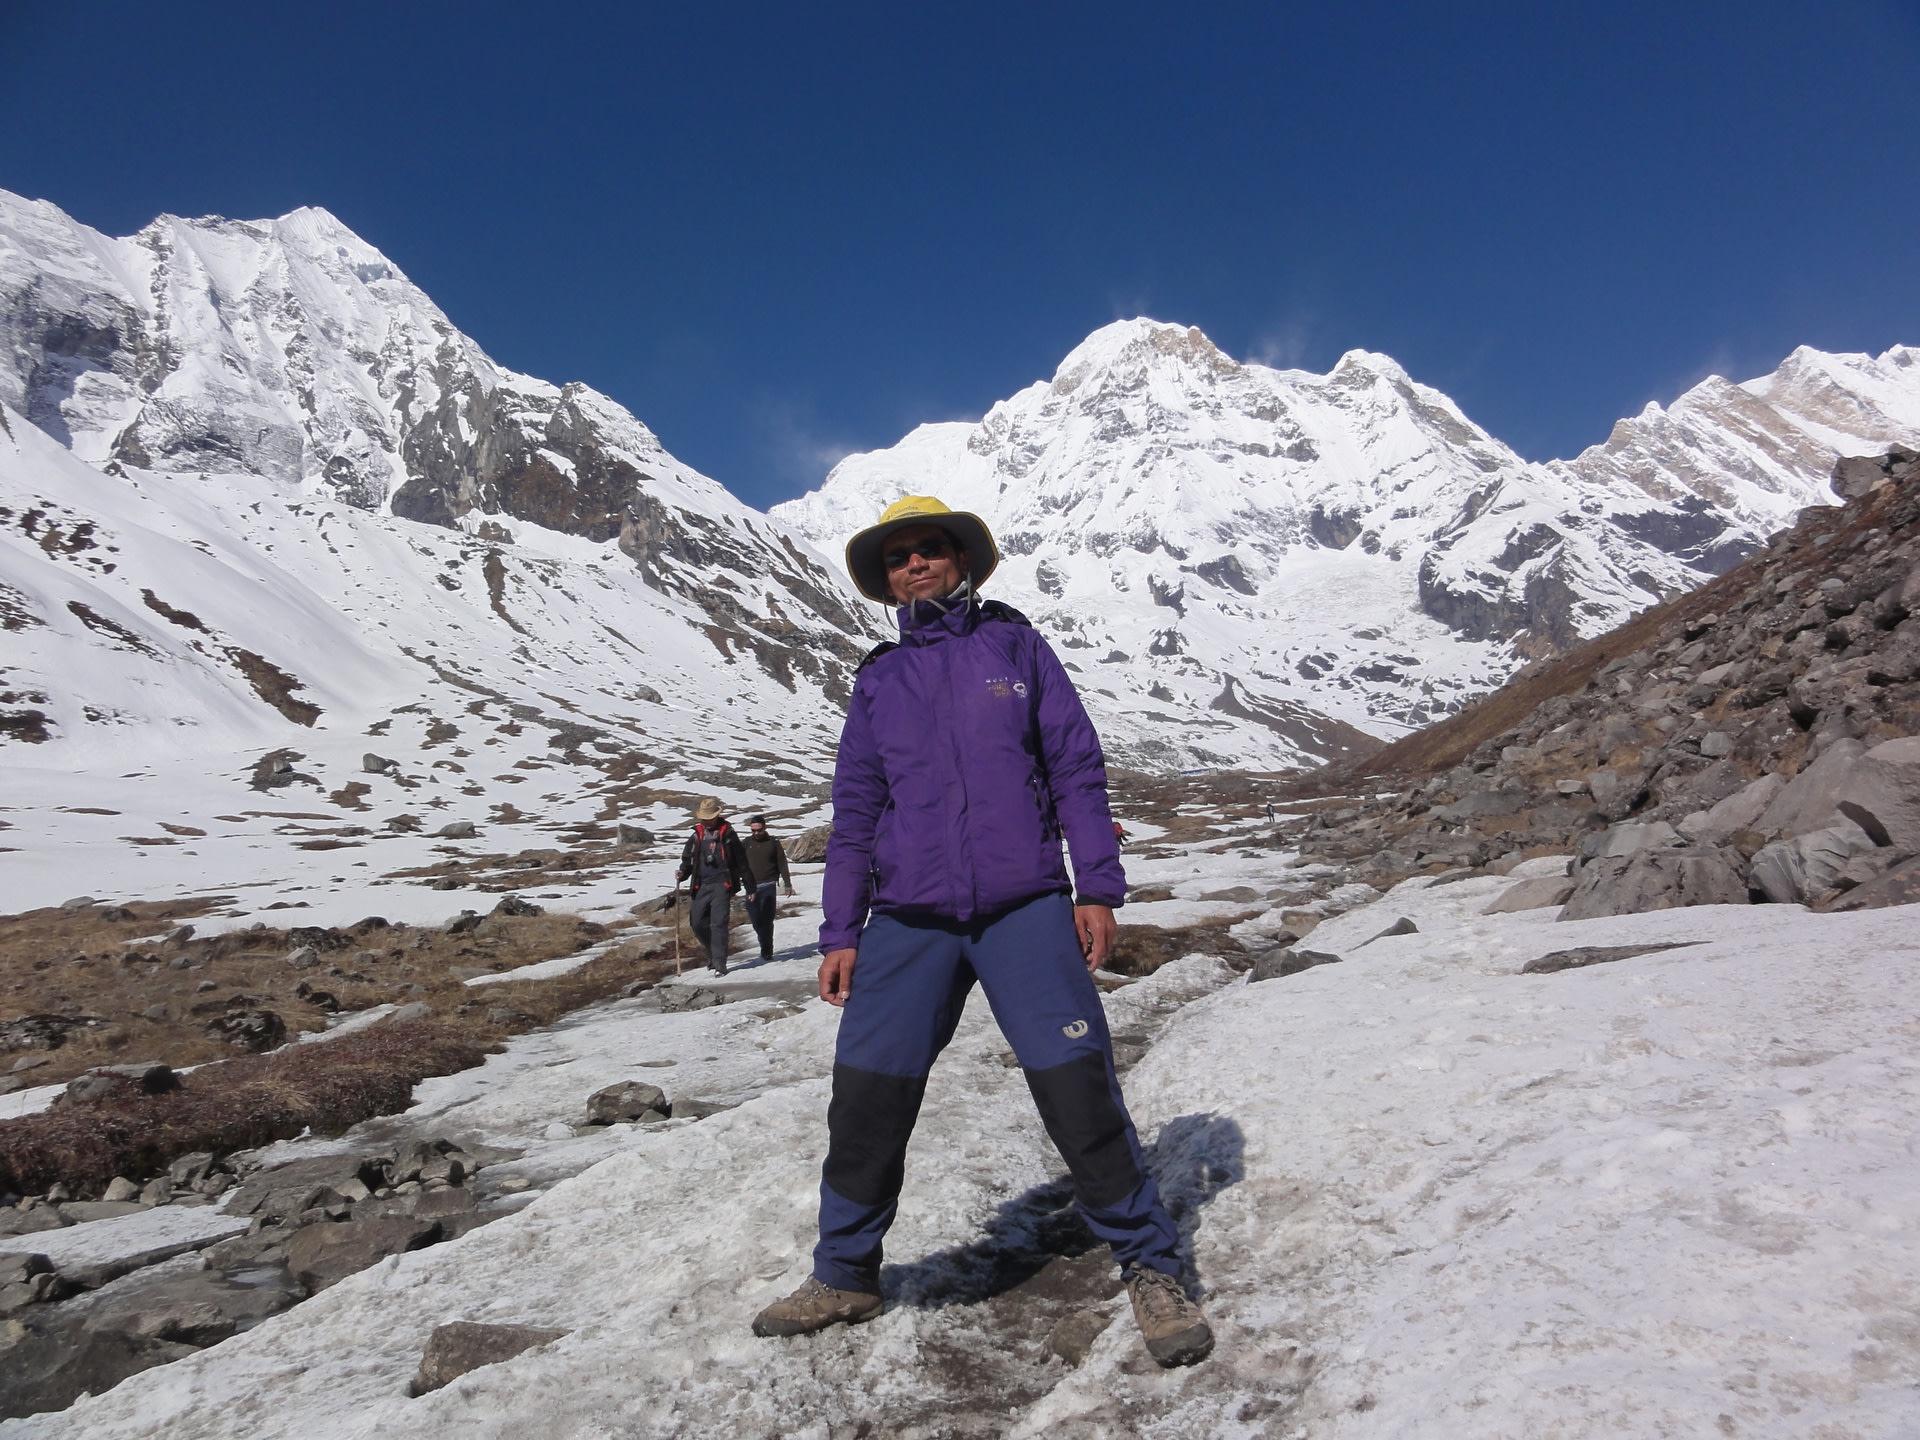 Trekking the Mt. Everest